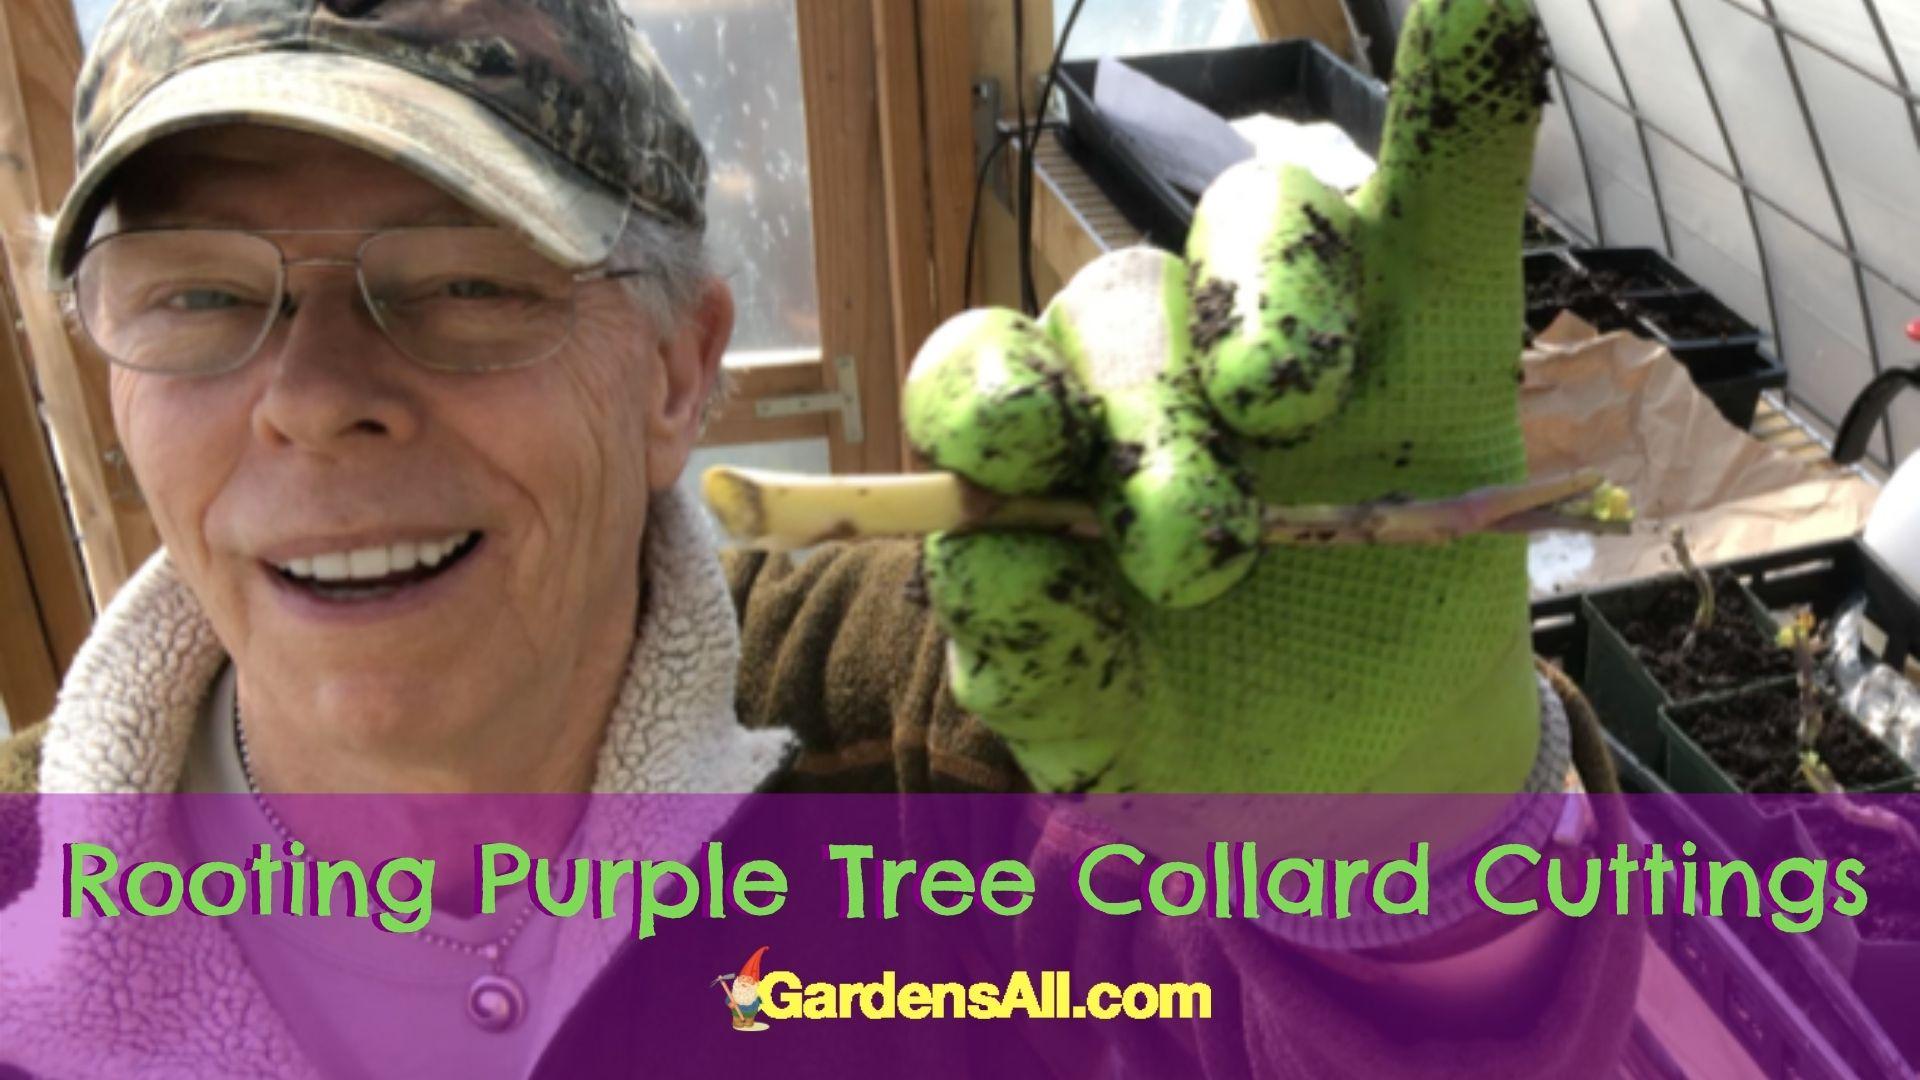 Coleman Alderson-Rooting Purple Tree Collards Cutting-image by GardensAll.com